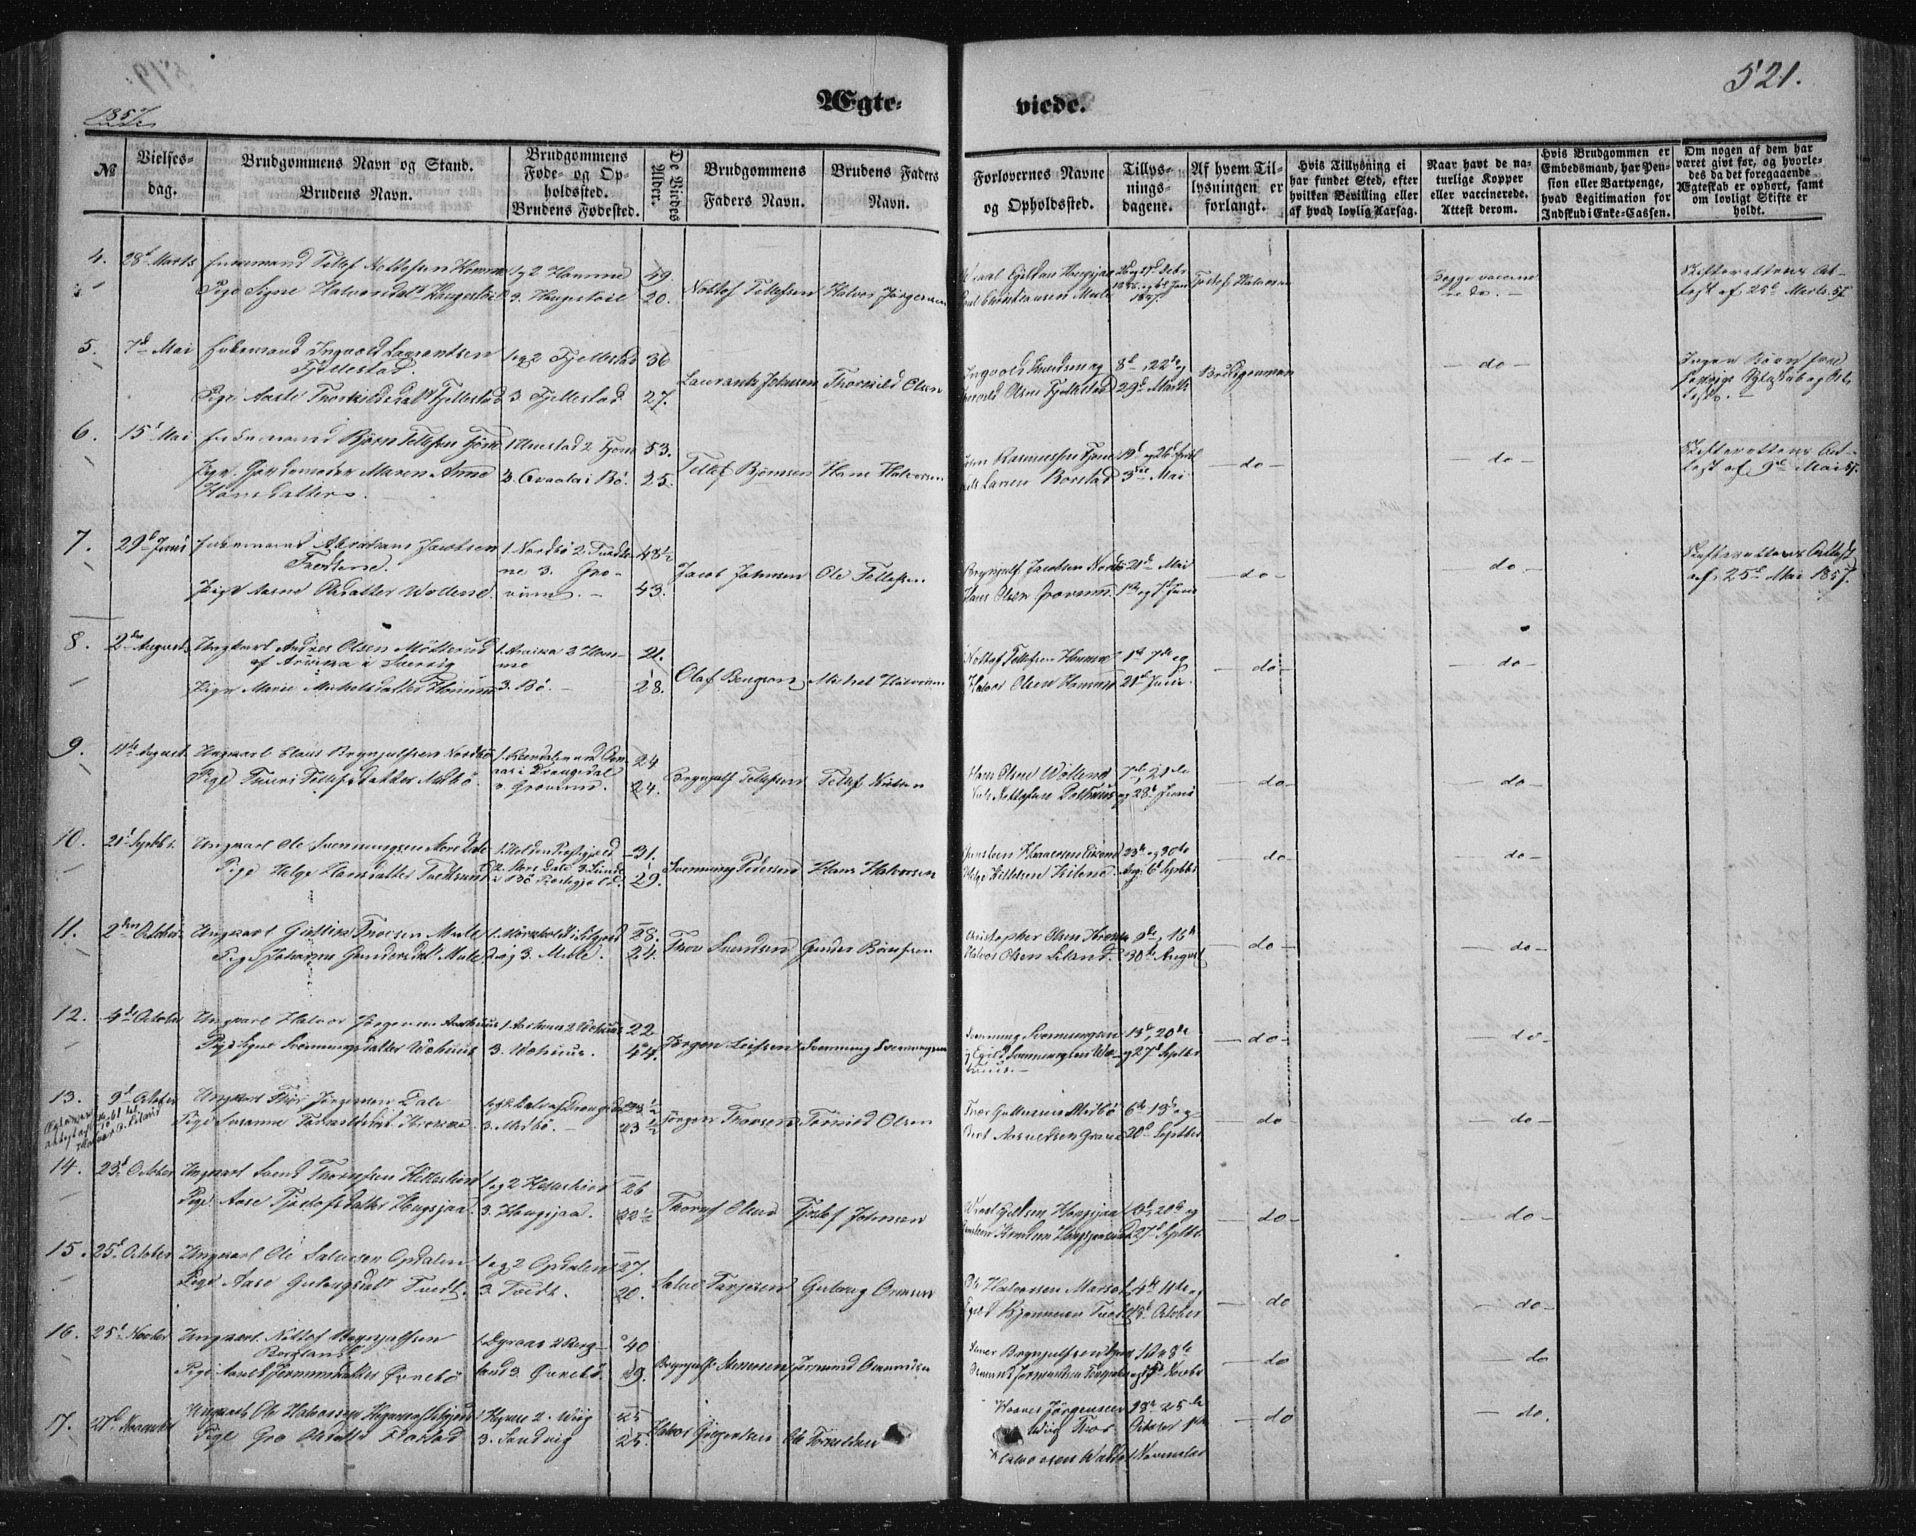 SAKO, Nissedal kirkebøker, F/Fa/L0003: Ministerialbok nr. I 3, 1846-1870, s. 520-521